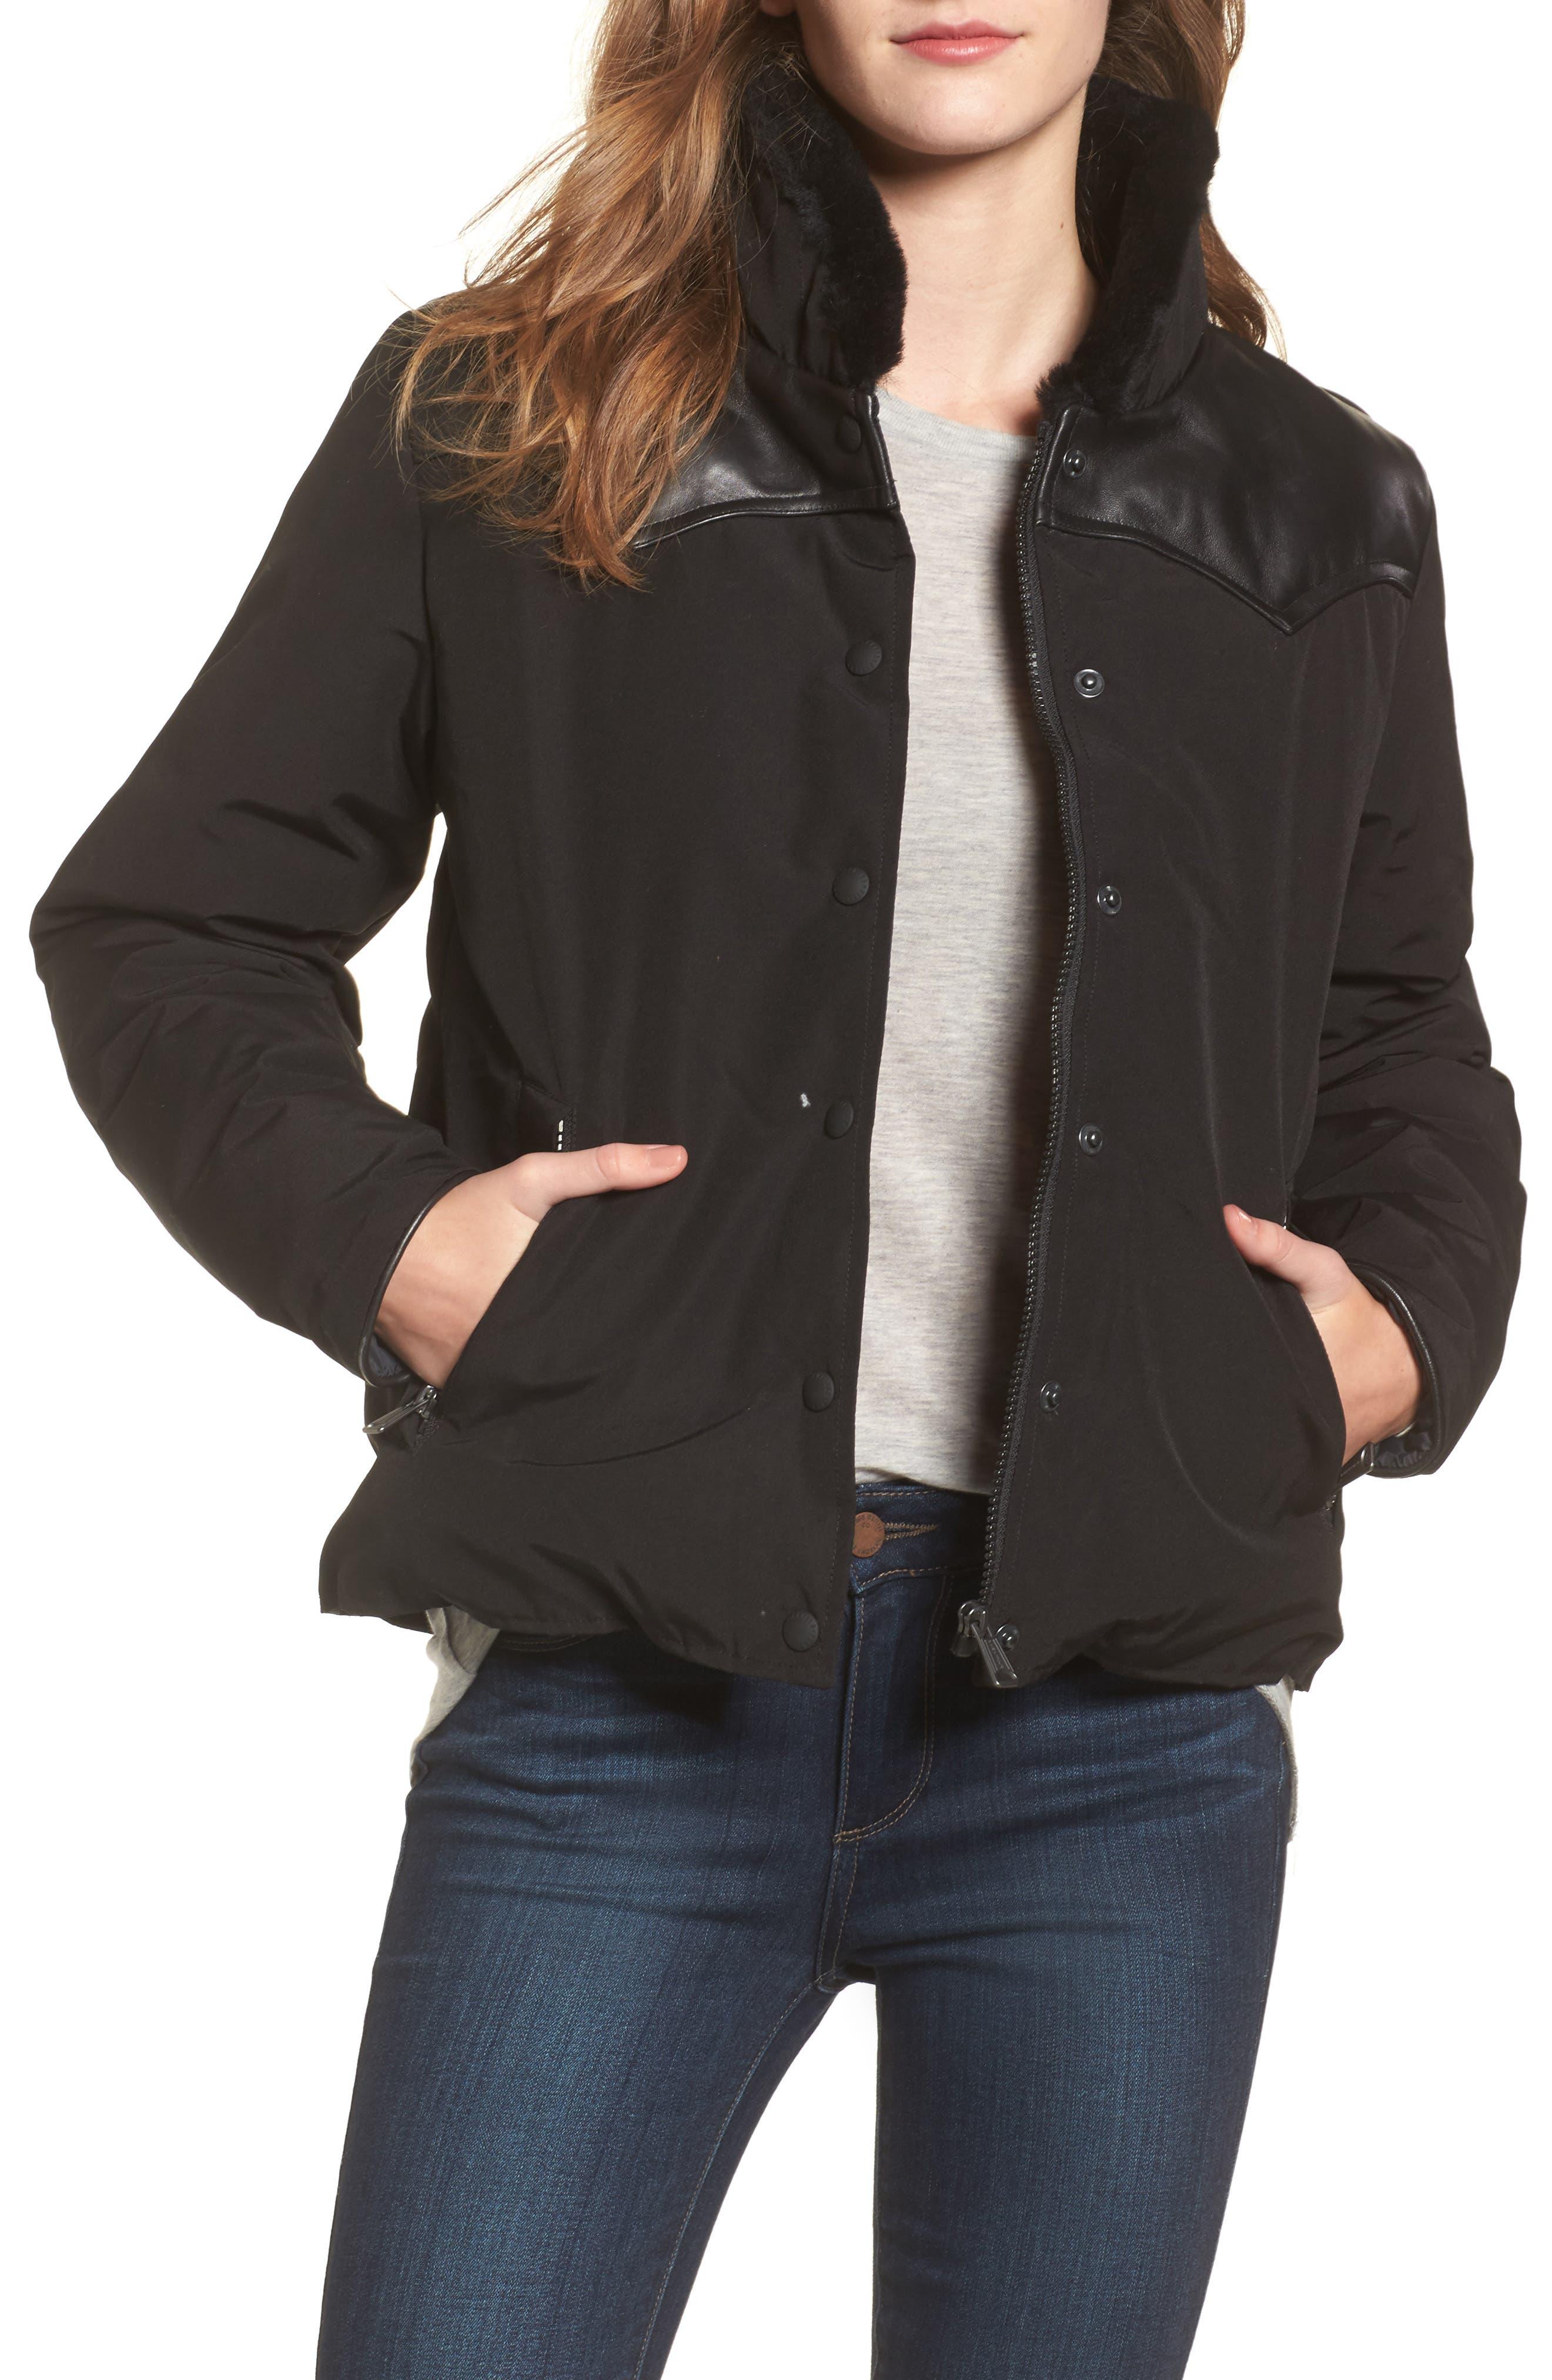 Main Image - Penfield Rockwool Down Jacket with Genuine Coyote Fur Trim